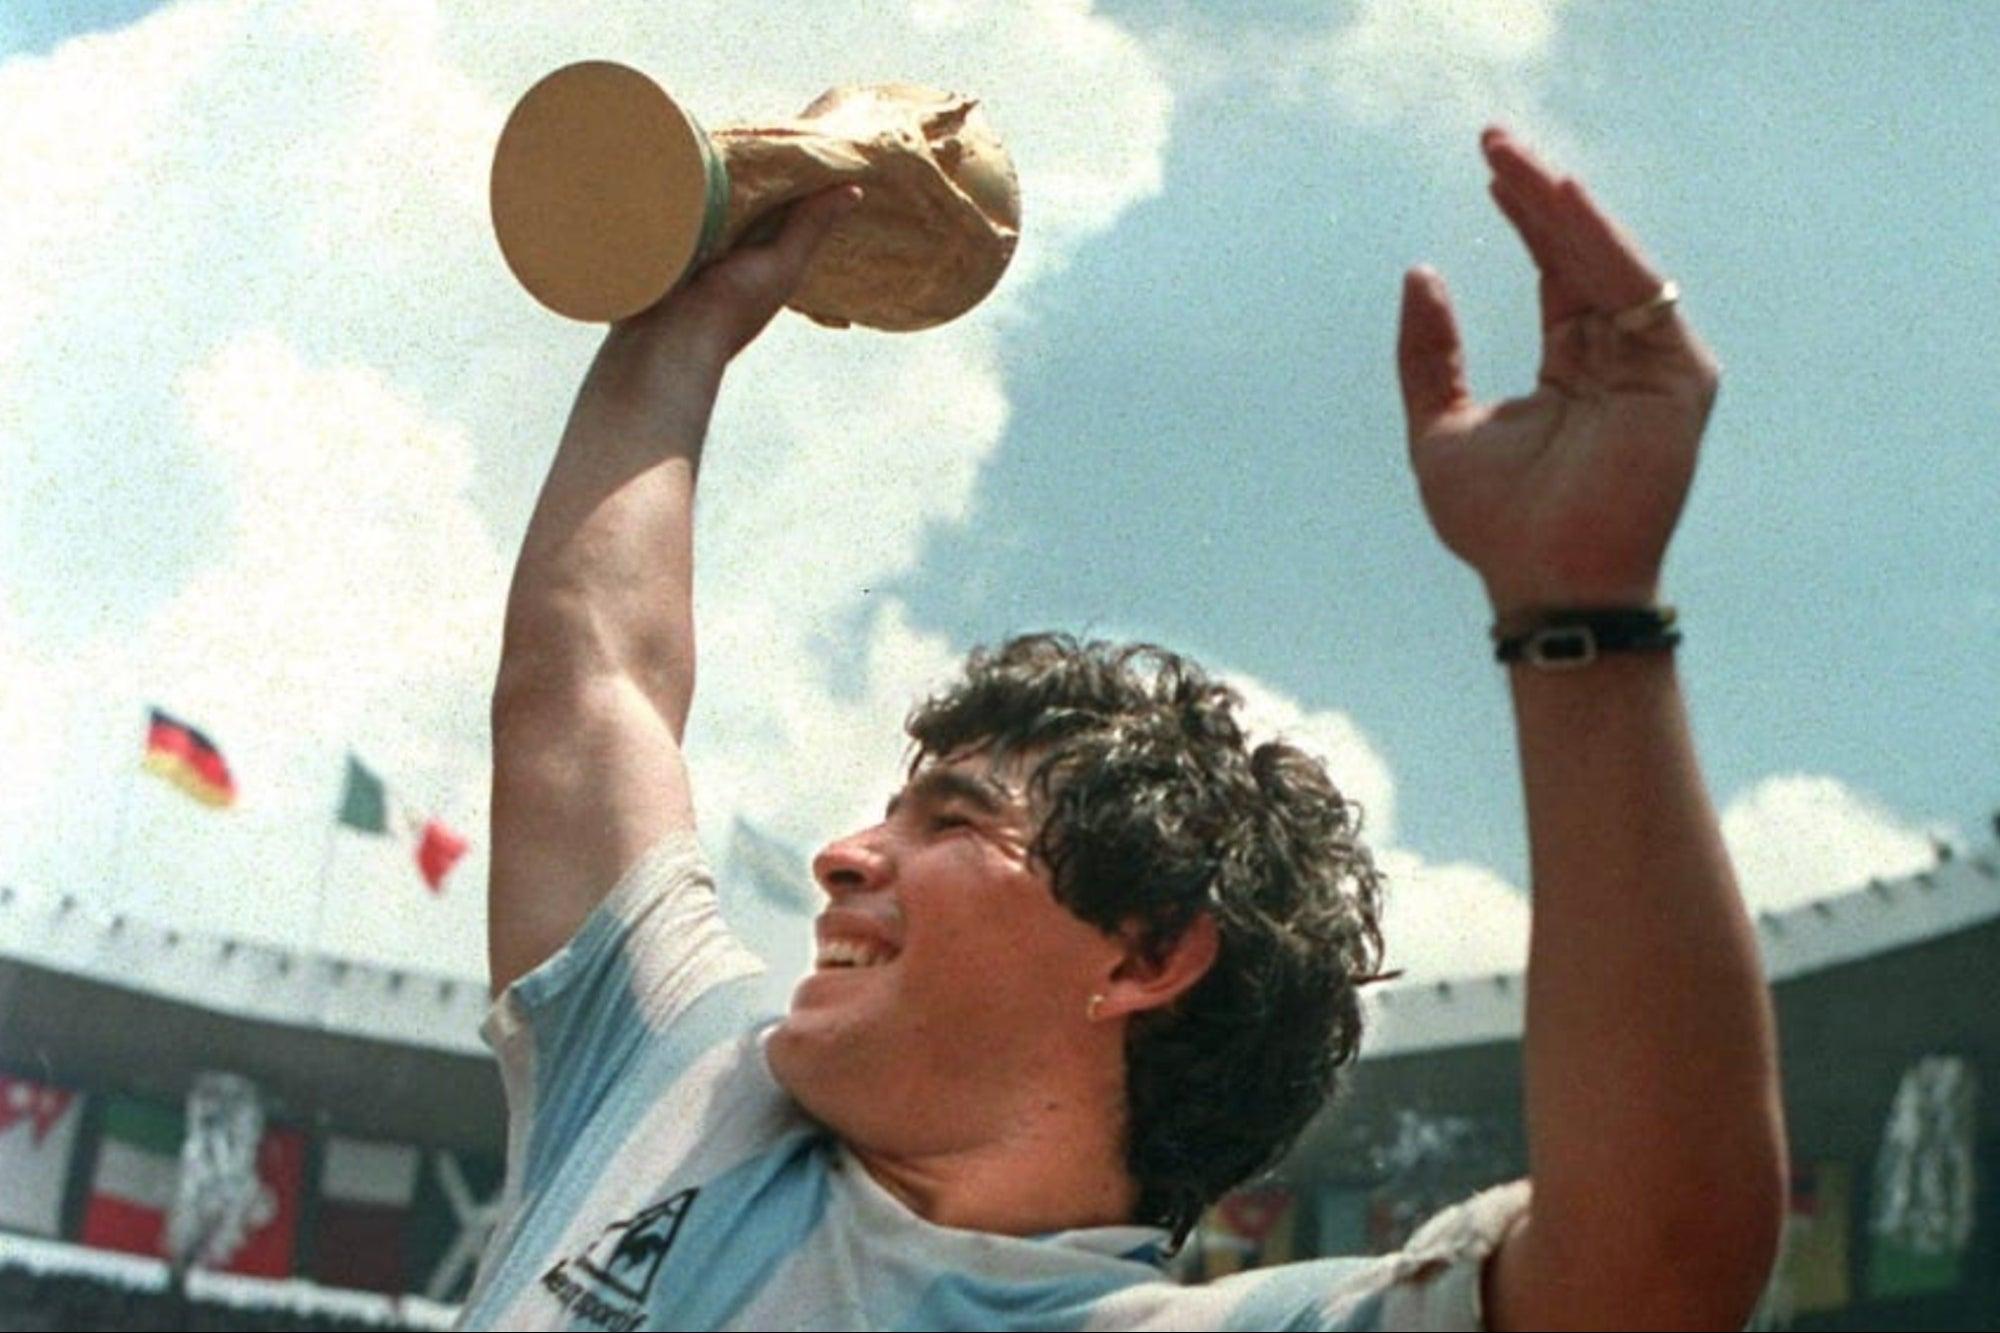 Who Was Diego Armando Maradona?